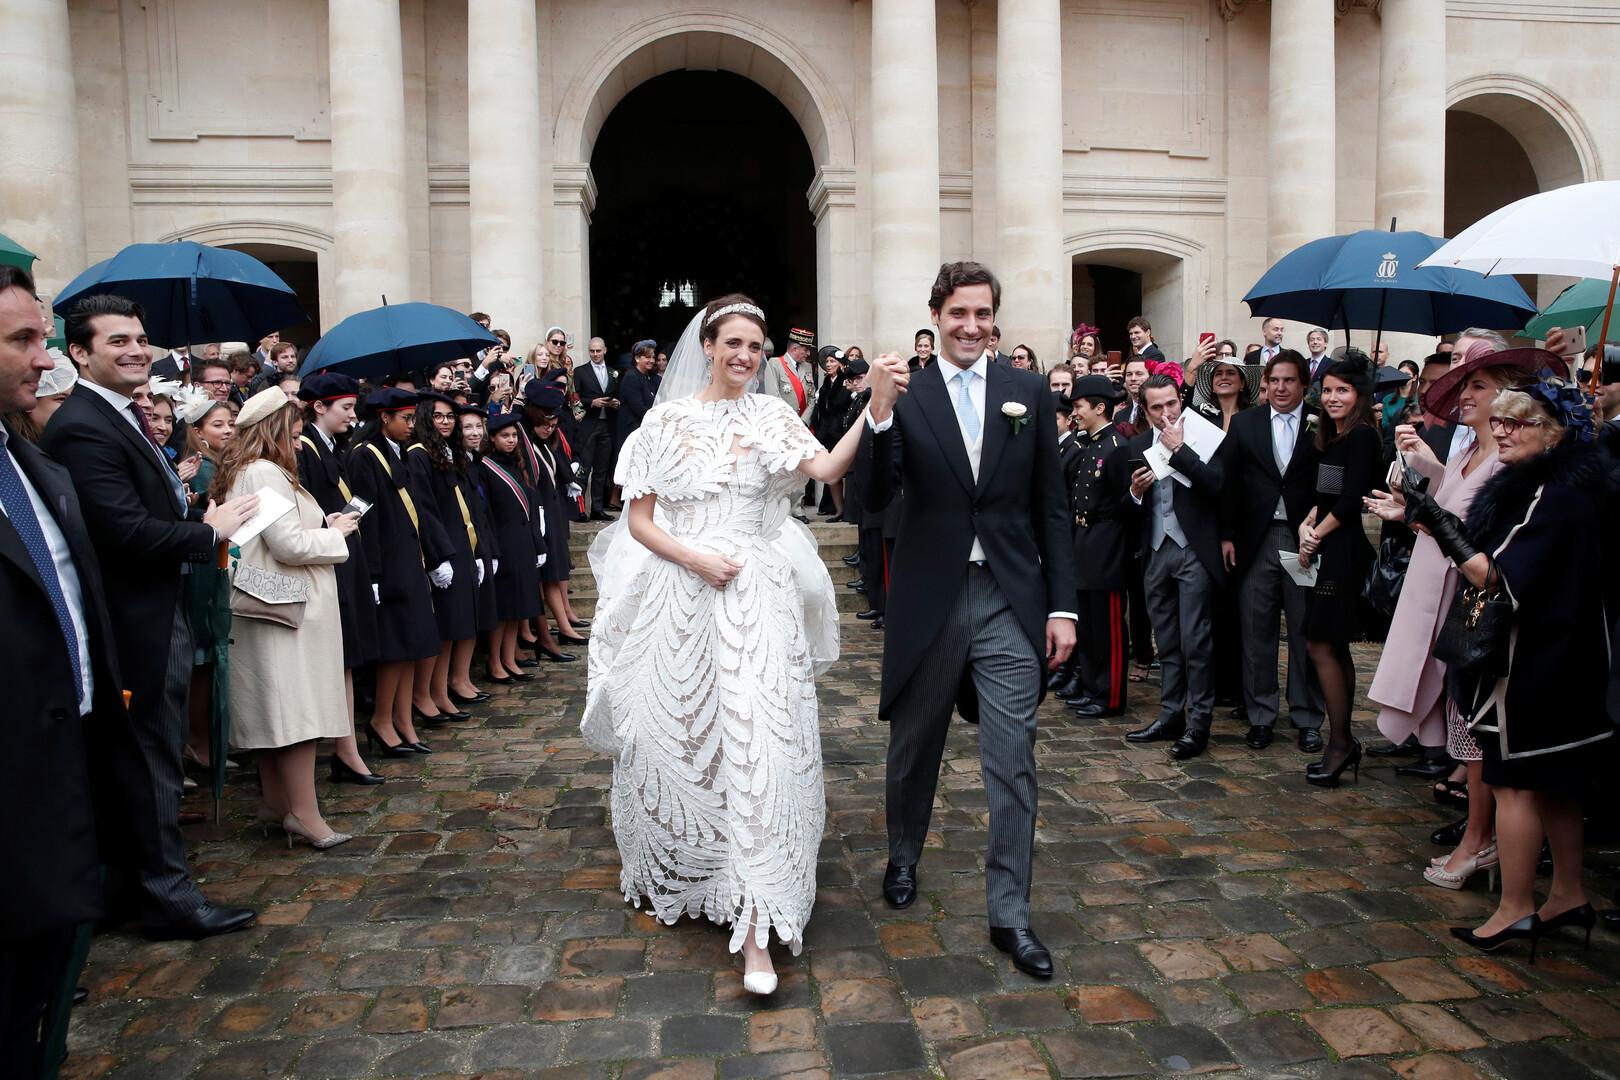 زواج ملكي فخم لحفيد نابليون بونابرت (صور)